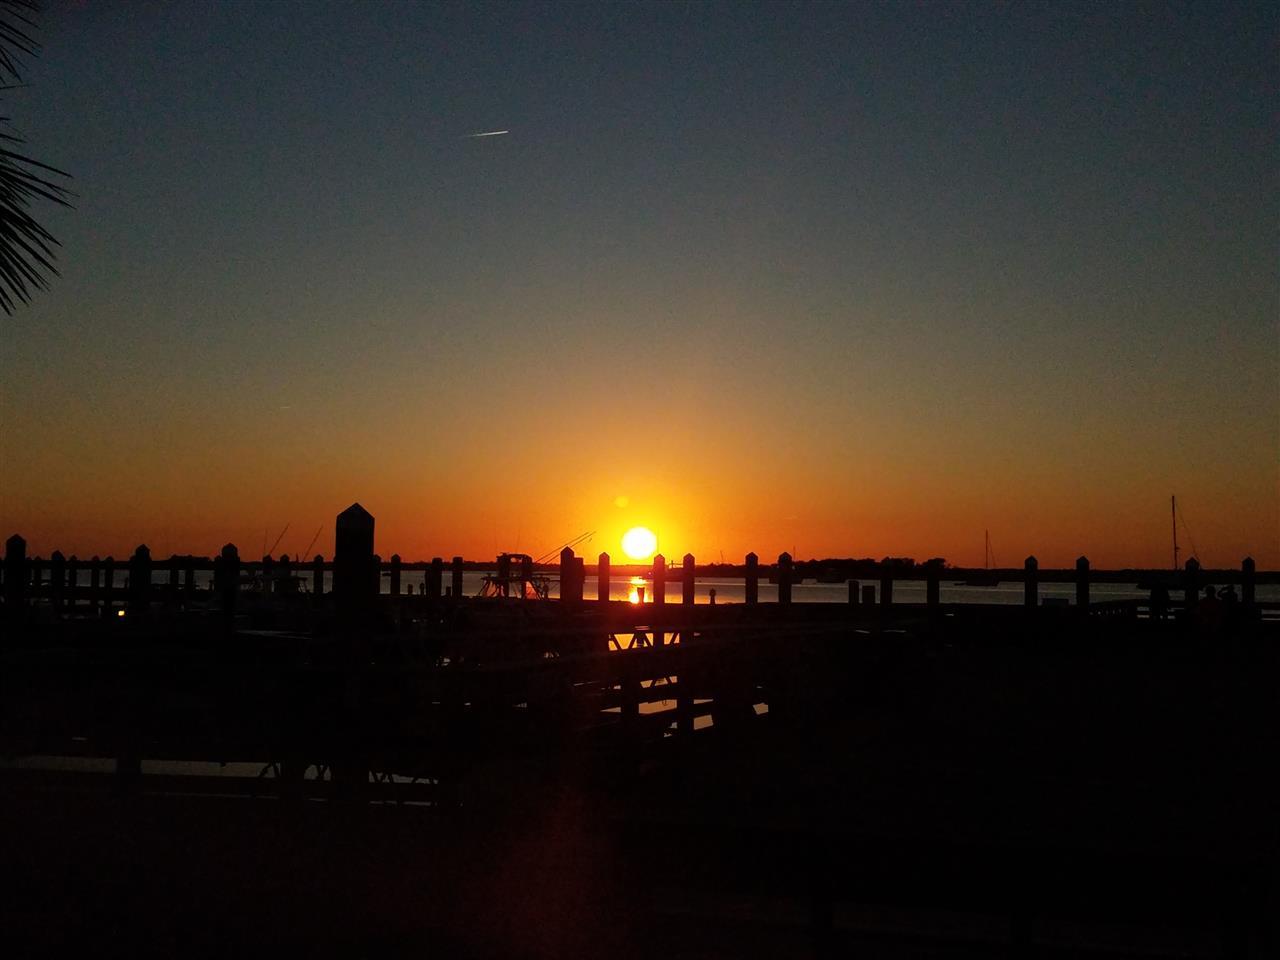 Beautiful sunset at the marina in downtown Fernandina Beach, FL